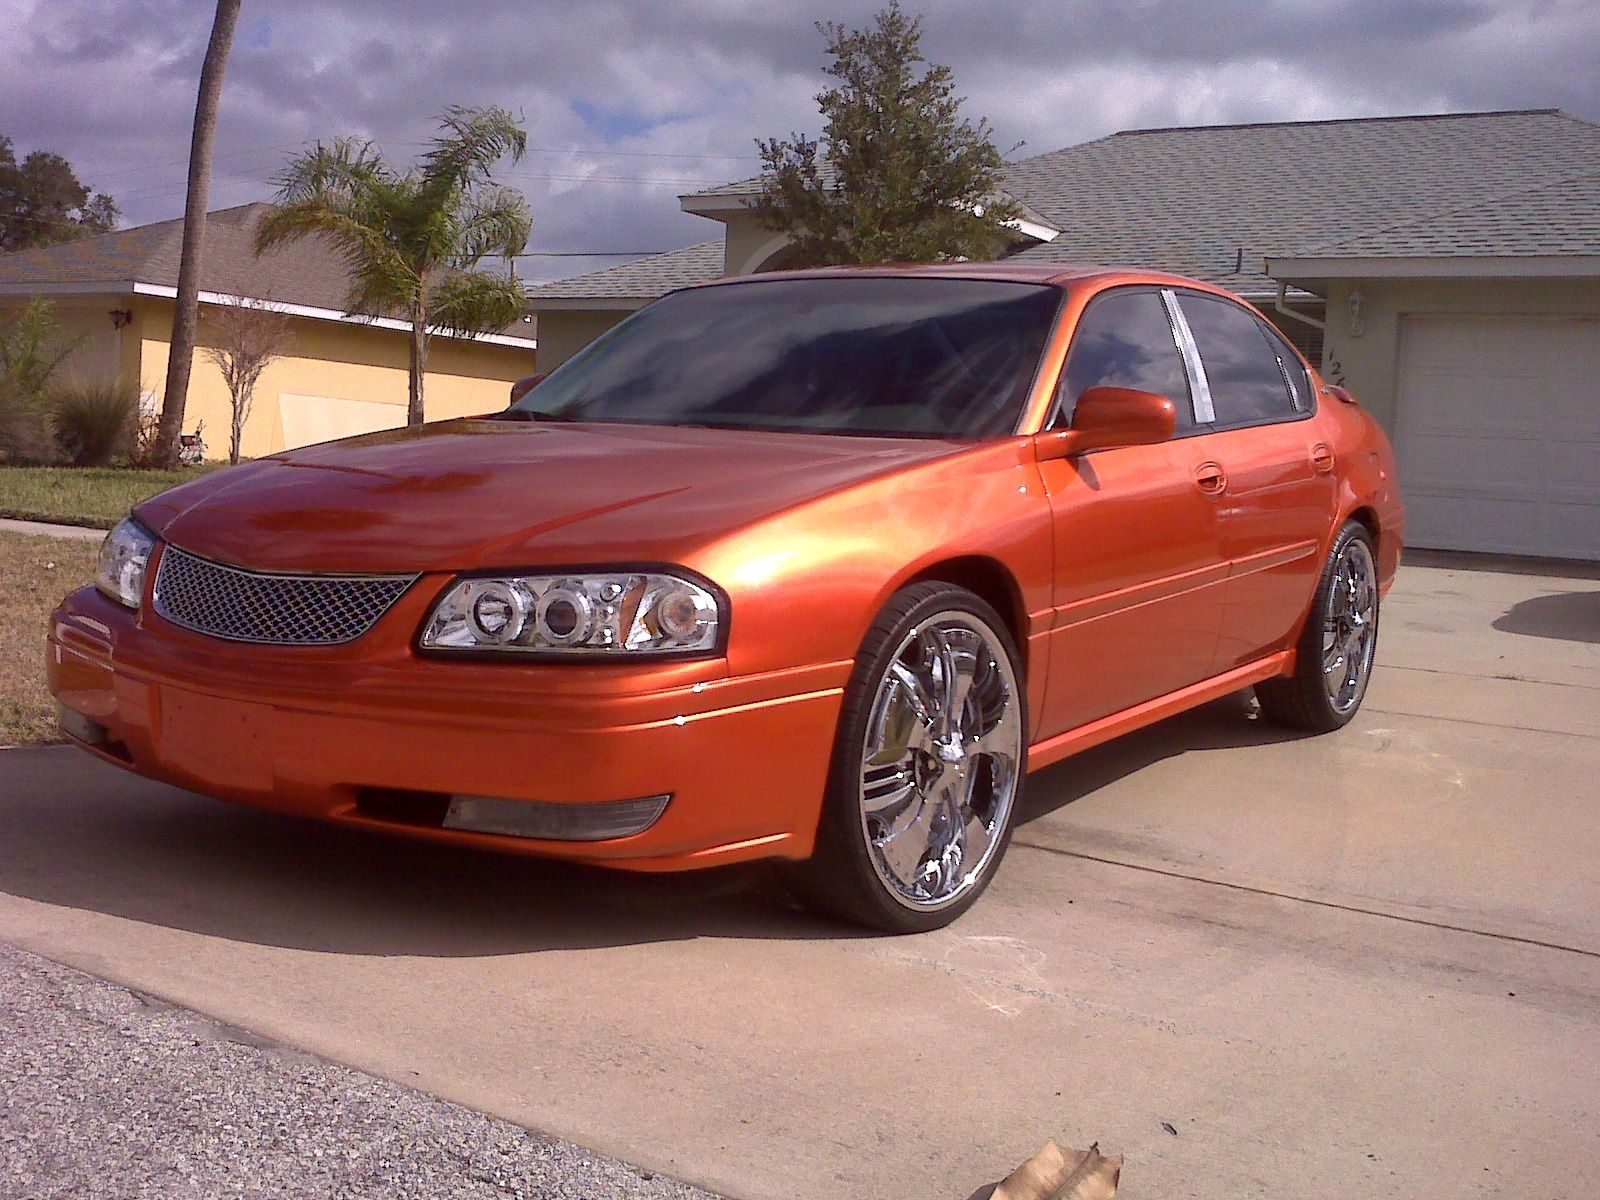 small resolution of 2000 chevy impala swangin n bangin s 2000 chevrolet impala in miami fl